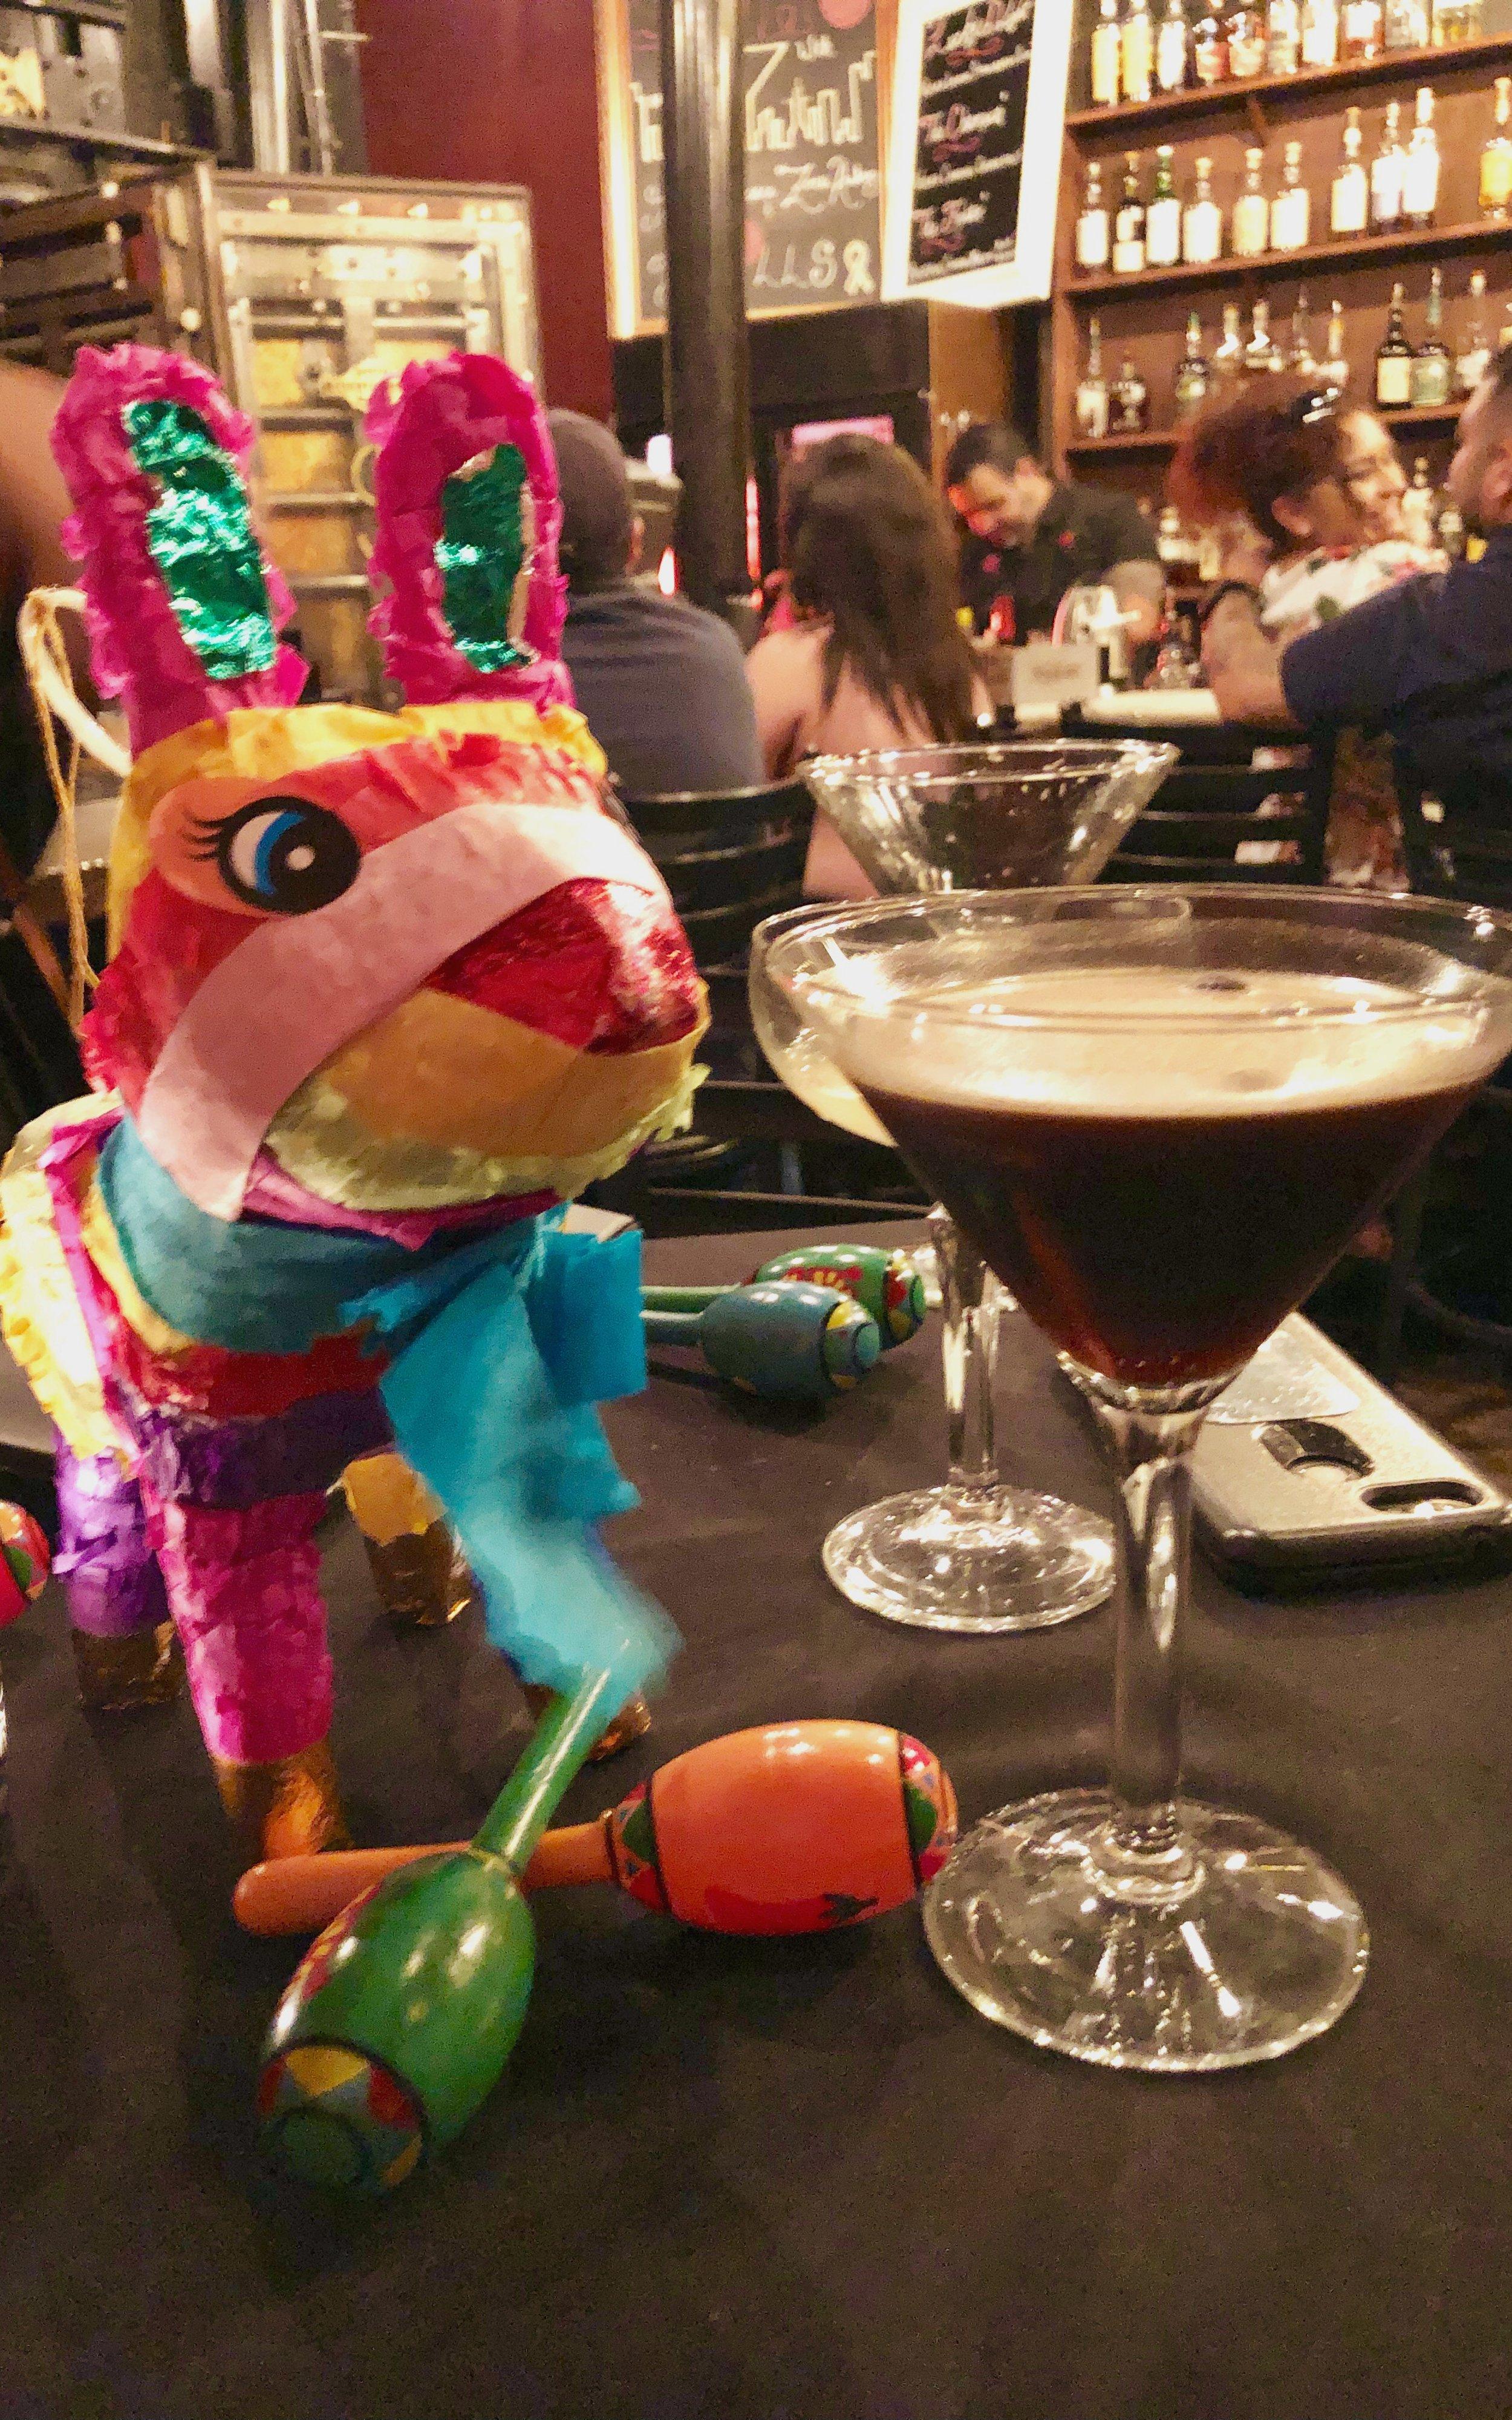 my friend and i celebrating cinco de mayo at SoHo Wine & Martini Bar